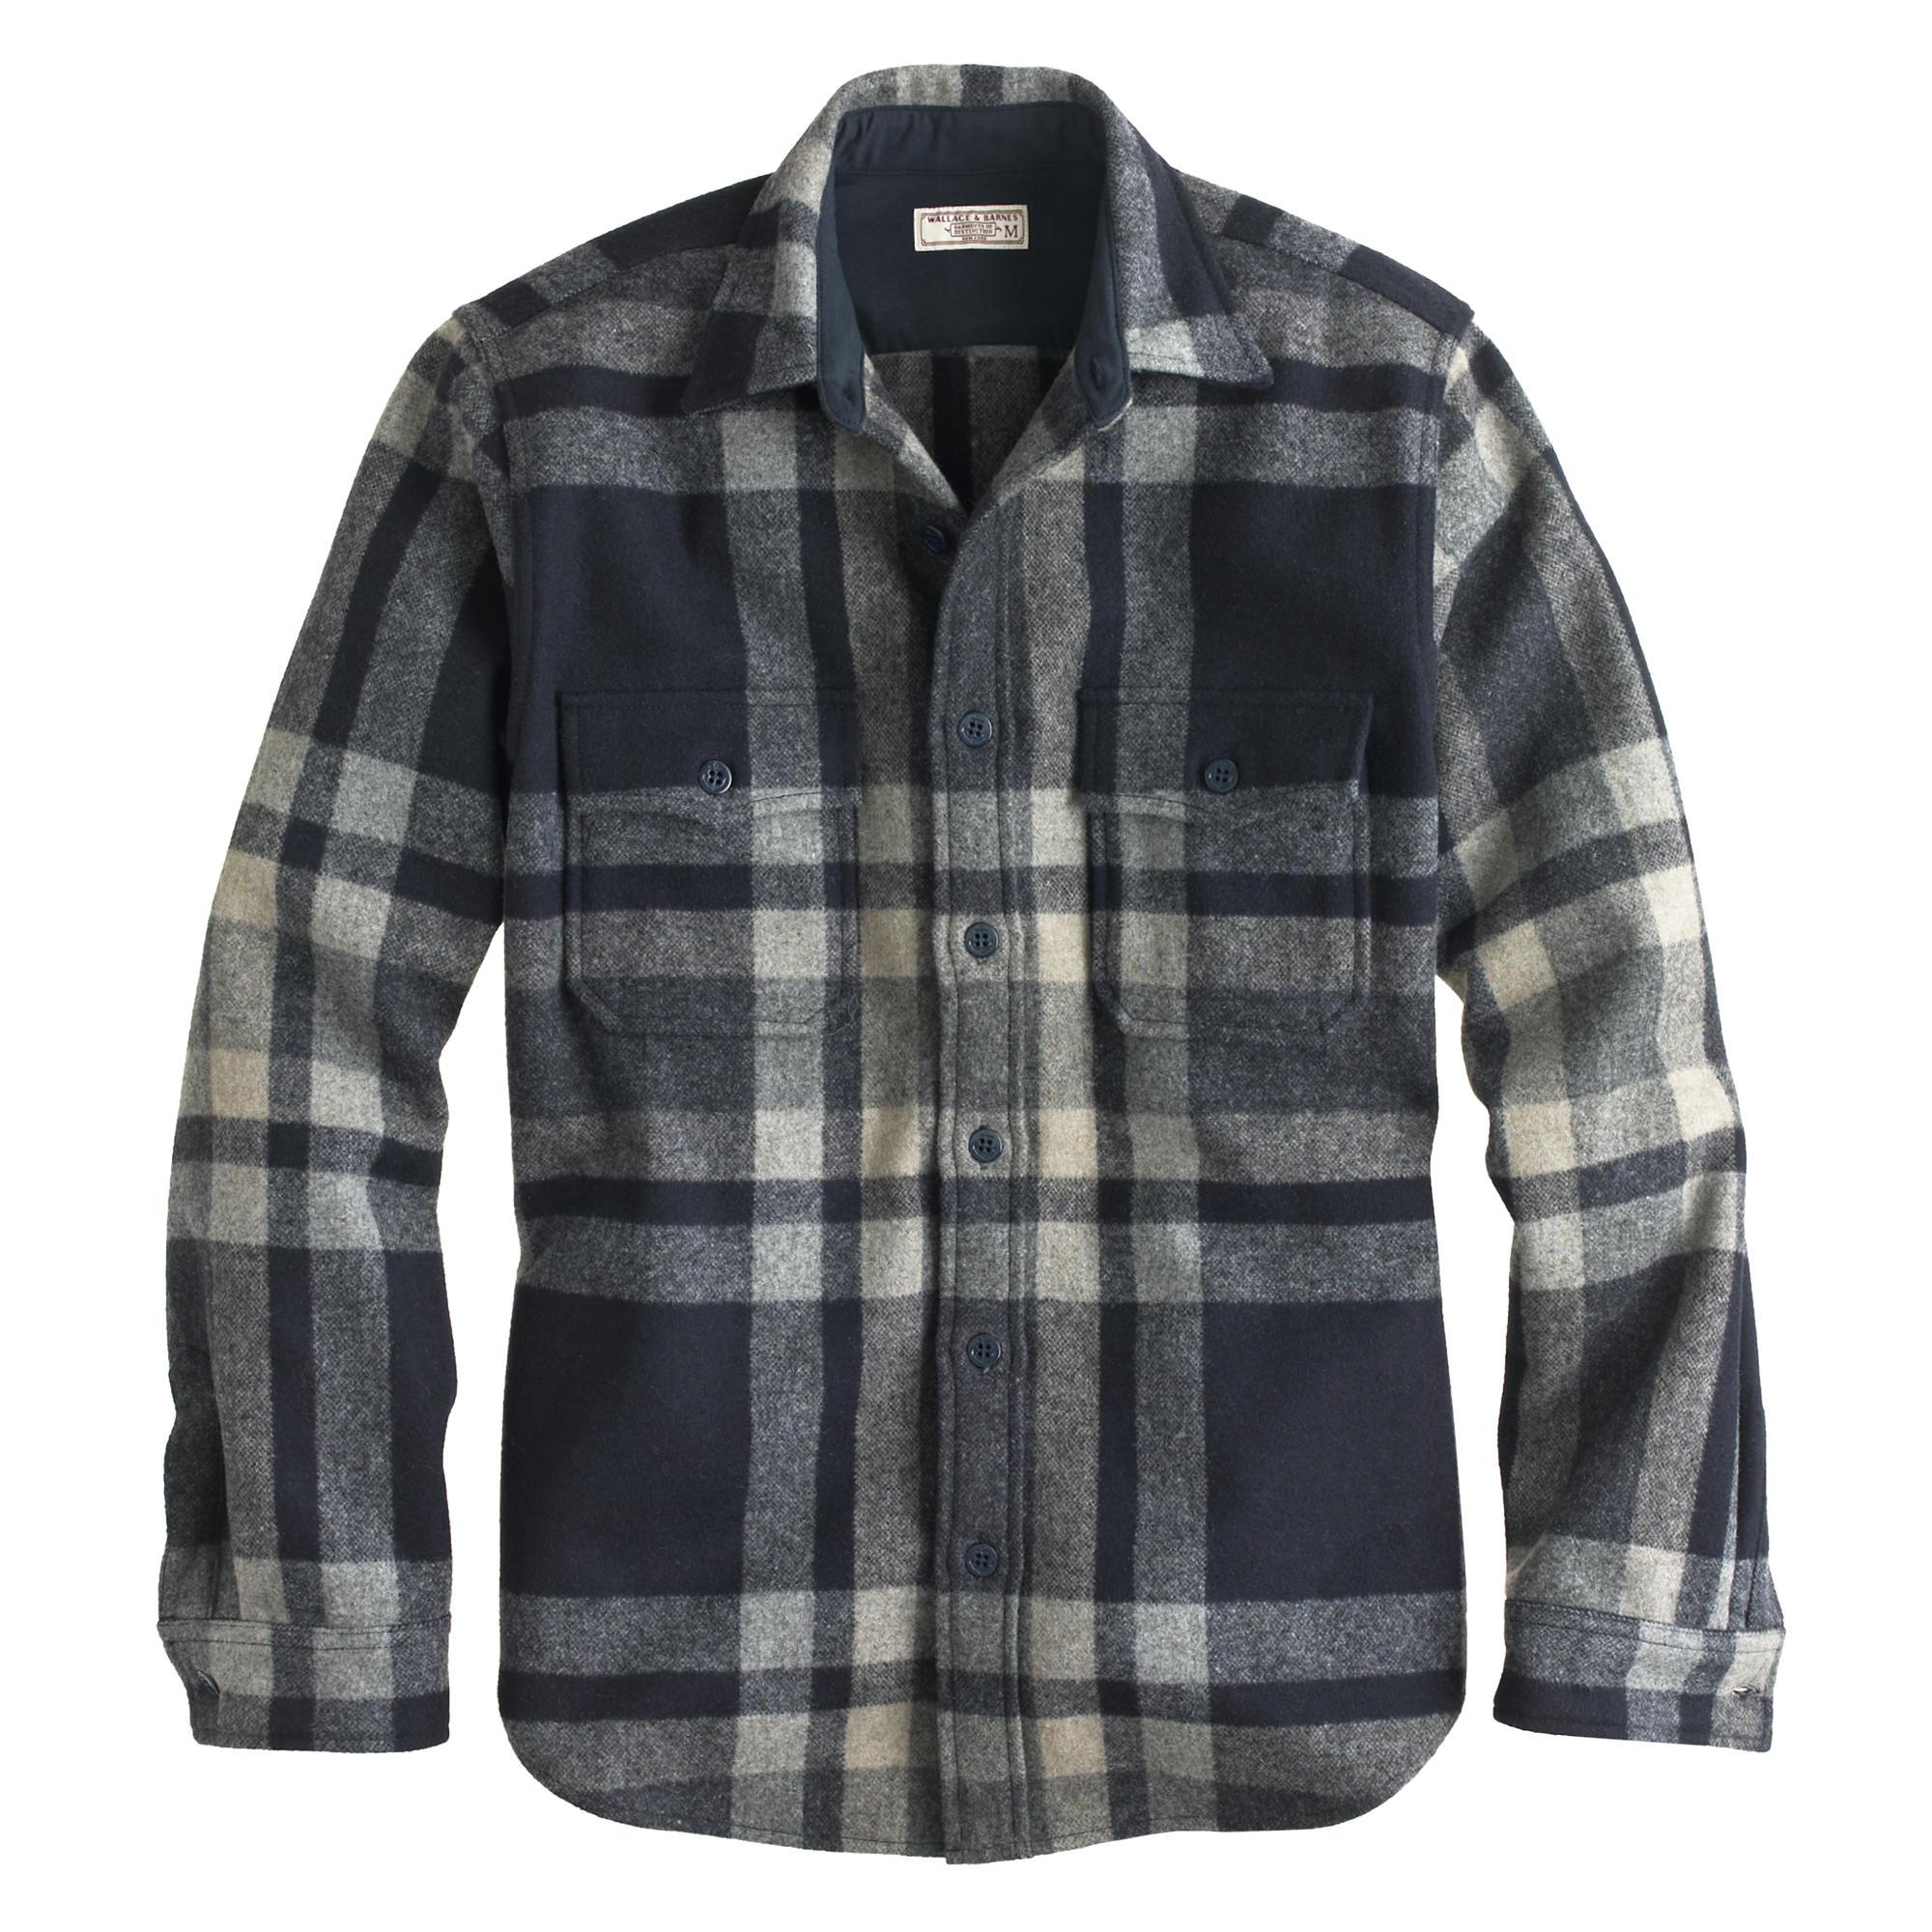 Wallace barnes plaid cpo shirt jacket j crew for Plaid shirt jacket mens